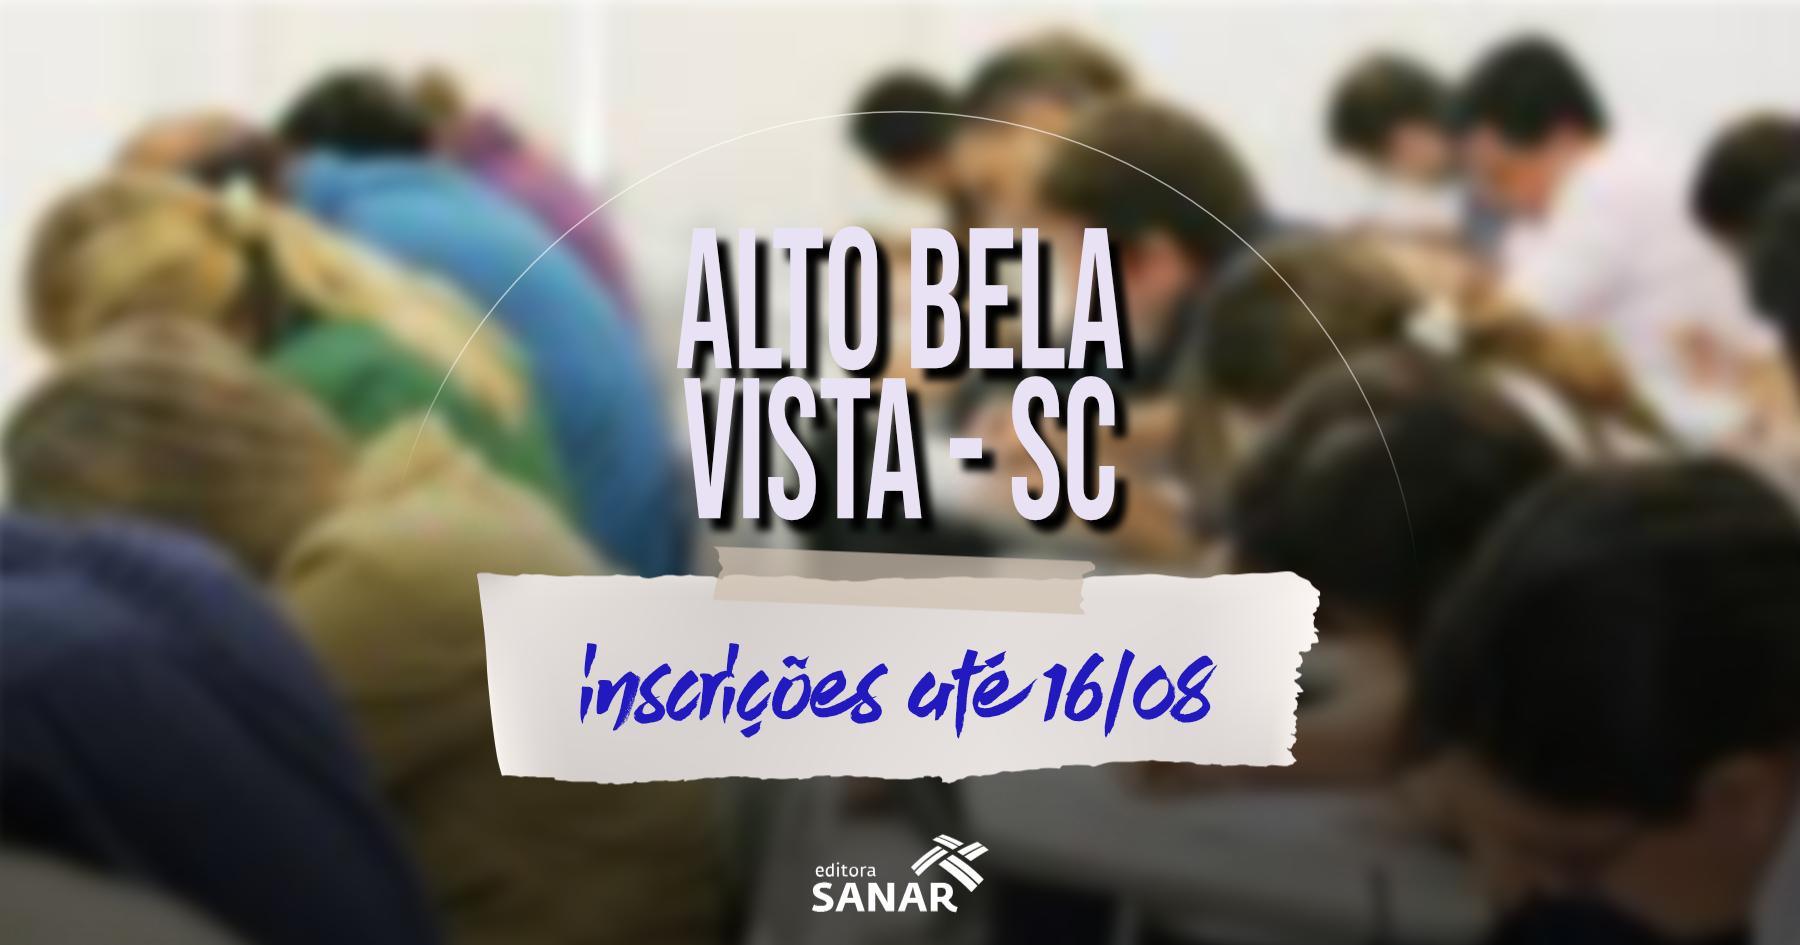 Concurso | Alto Bela Vista (SC) divulga edital